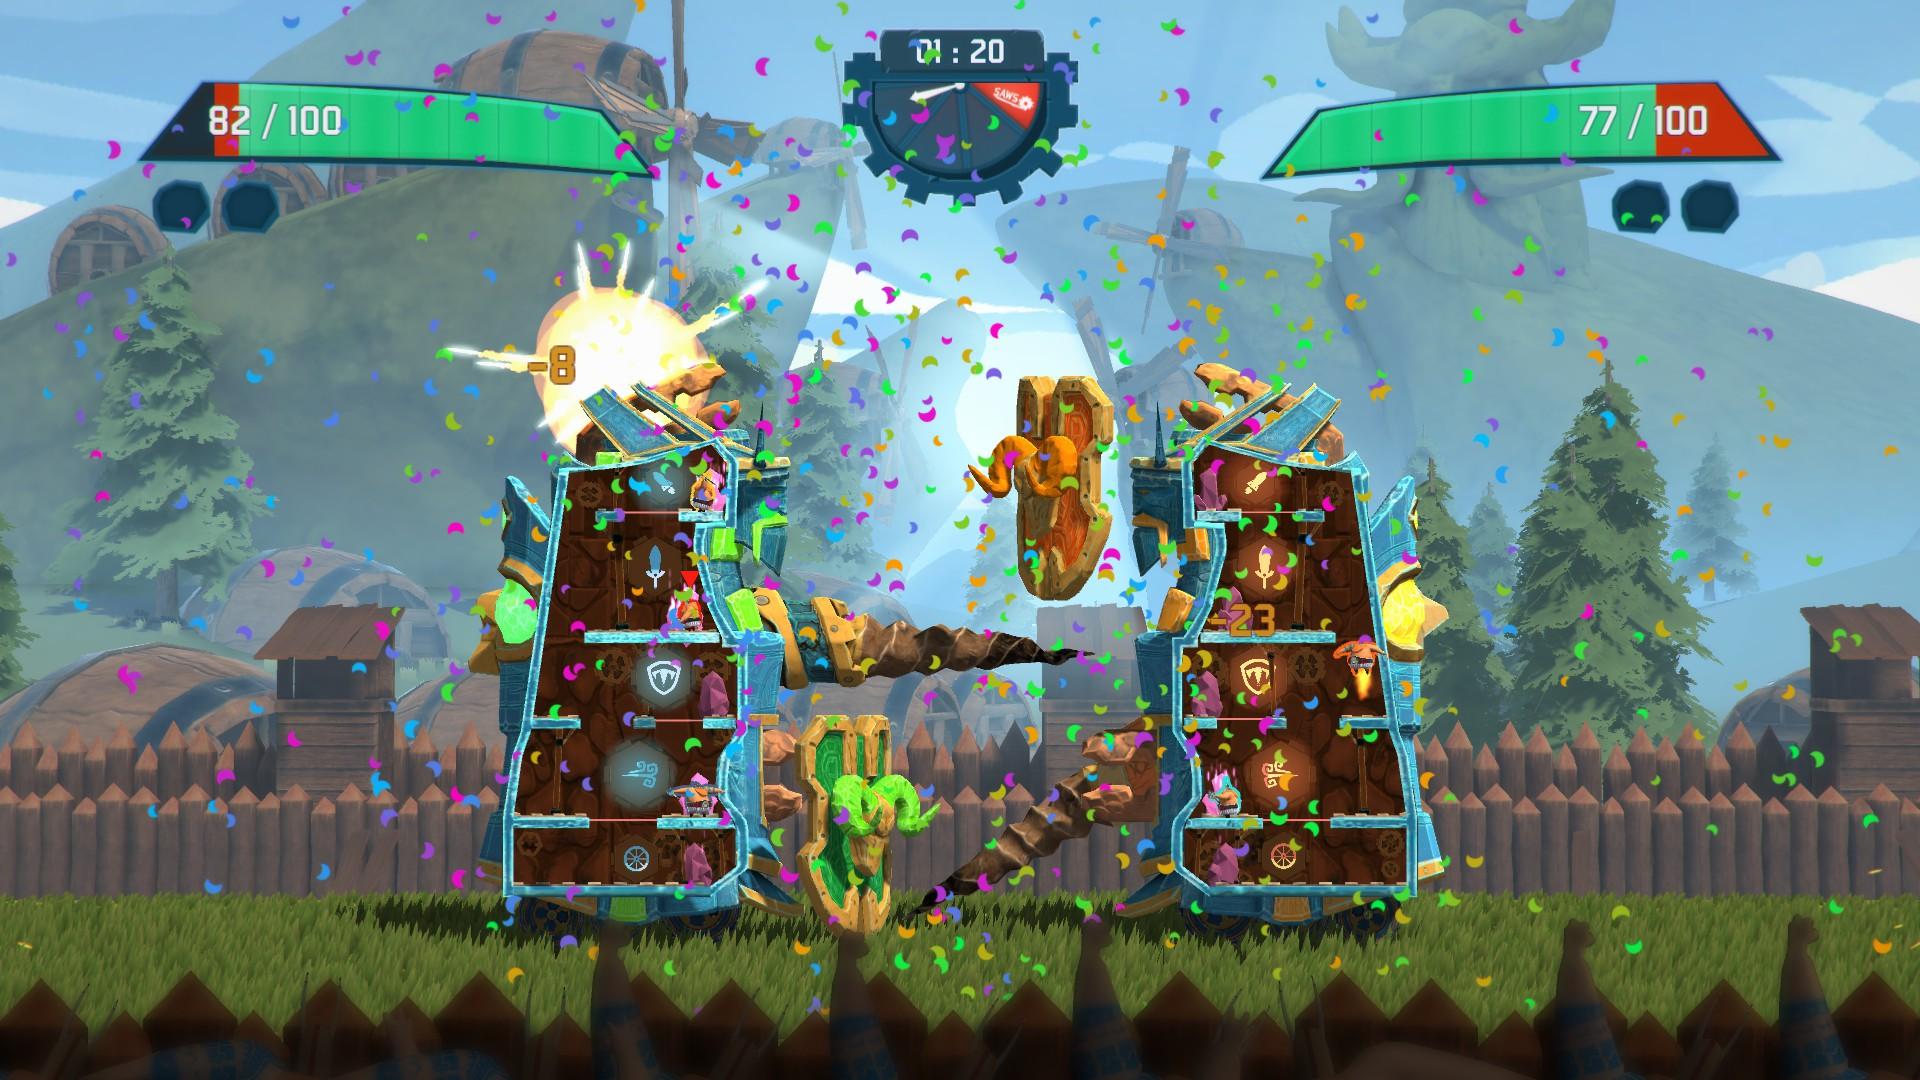 Image result for crewsaders game